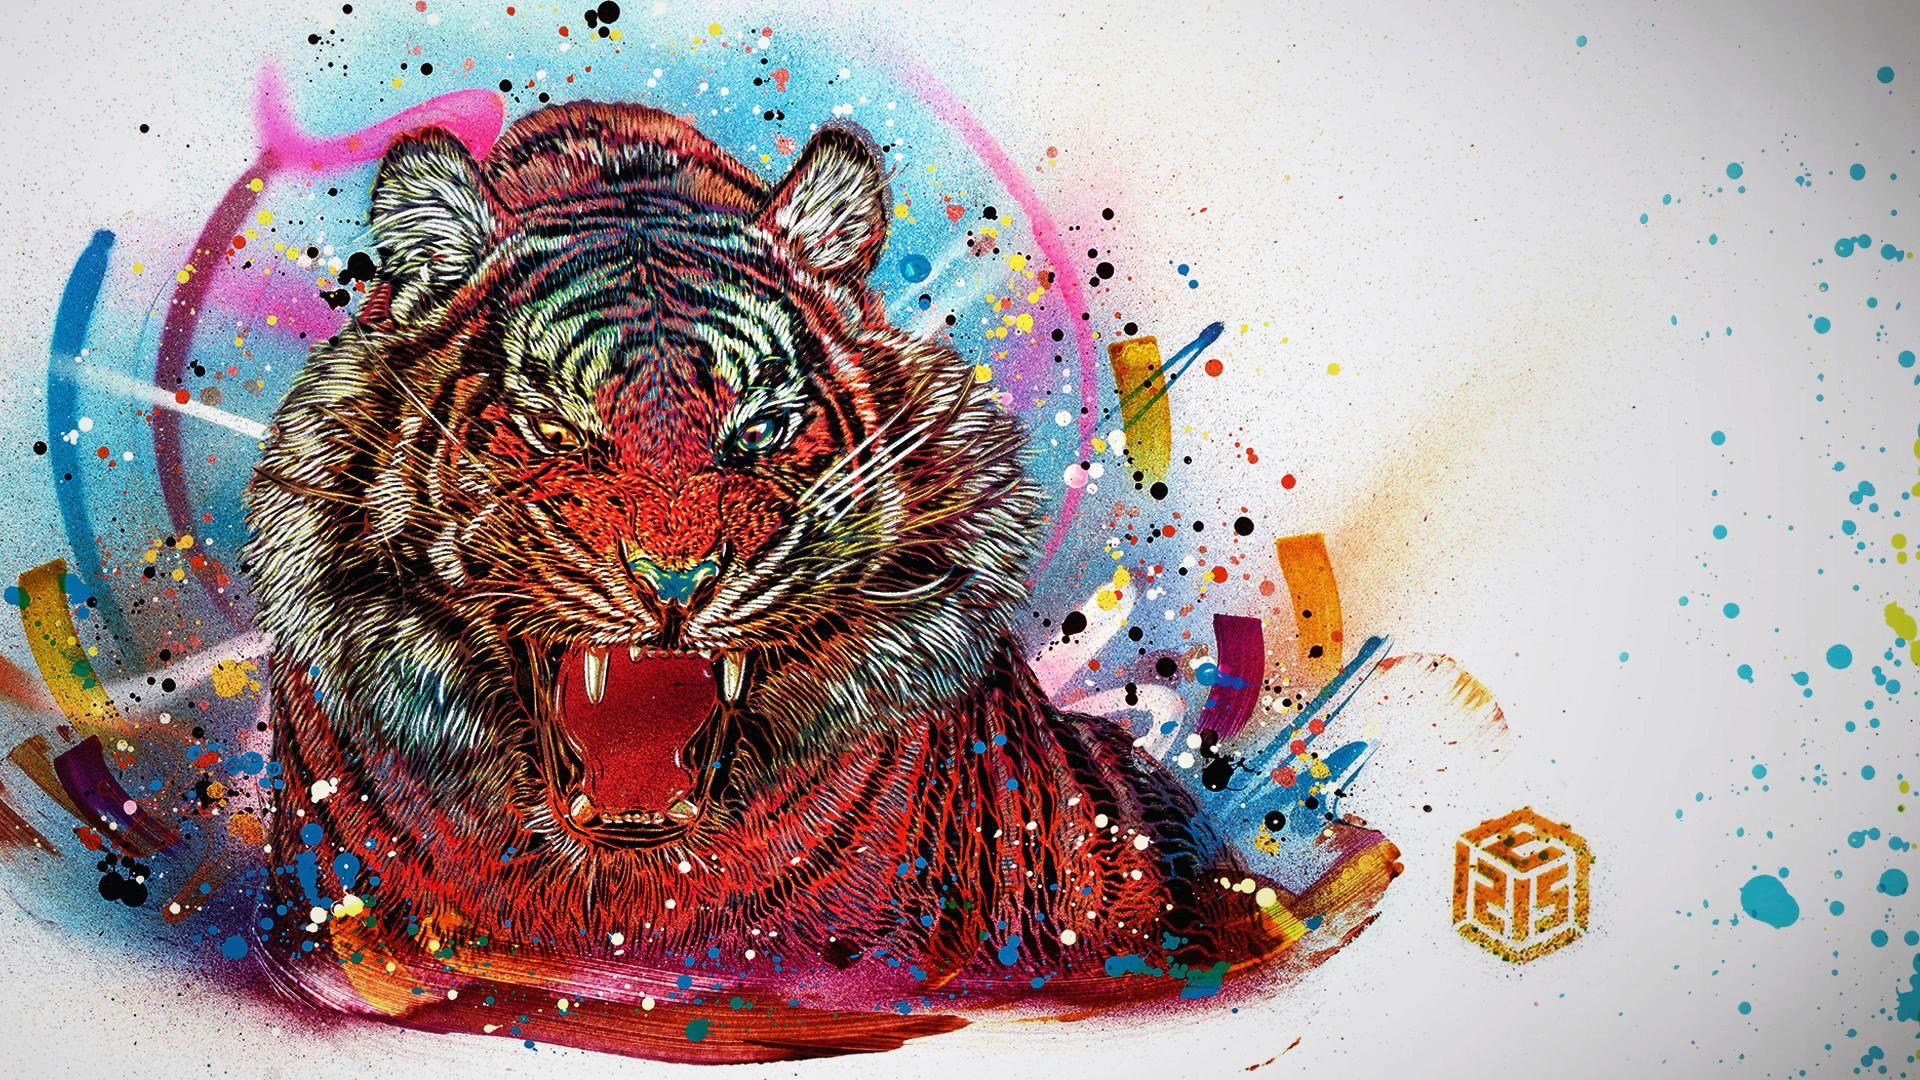 Far Cry 4 Tiger Art Tiger Art Far Cry 4 Tiger Wallpaper